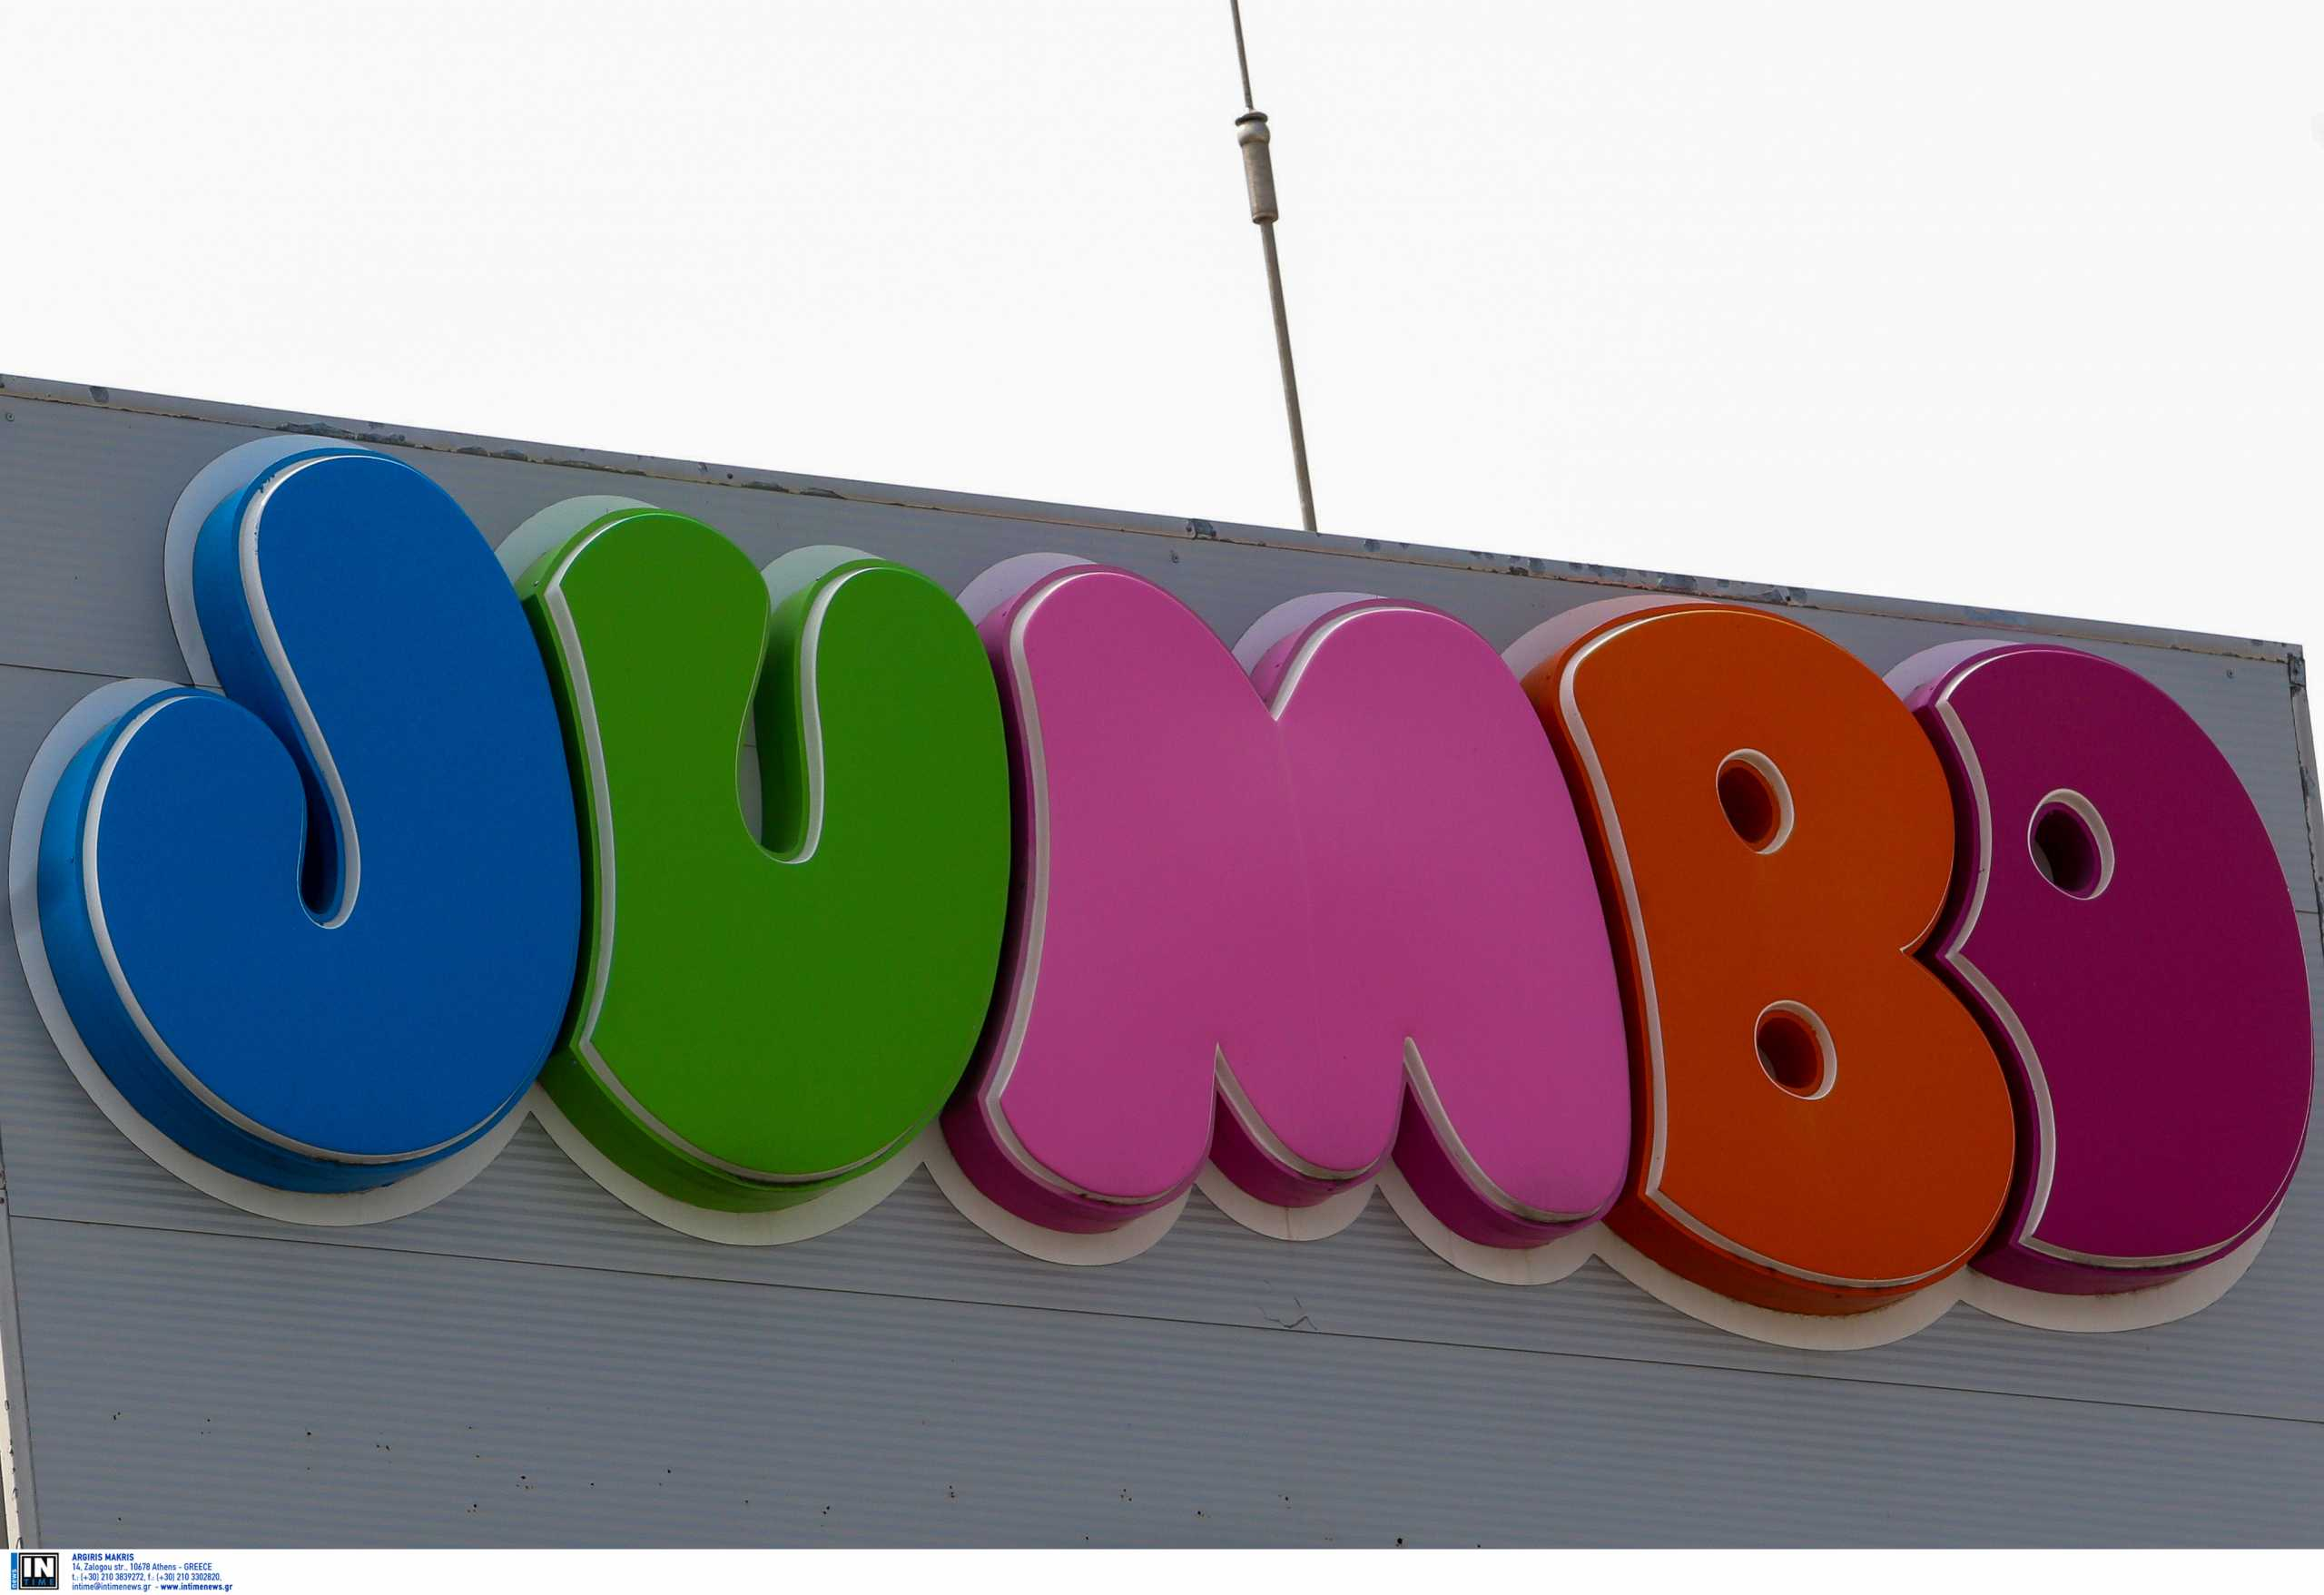 Jumbo: «Χάθηκε» το Τριώδιο και μειώθηκαν οι πωλήσεις